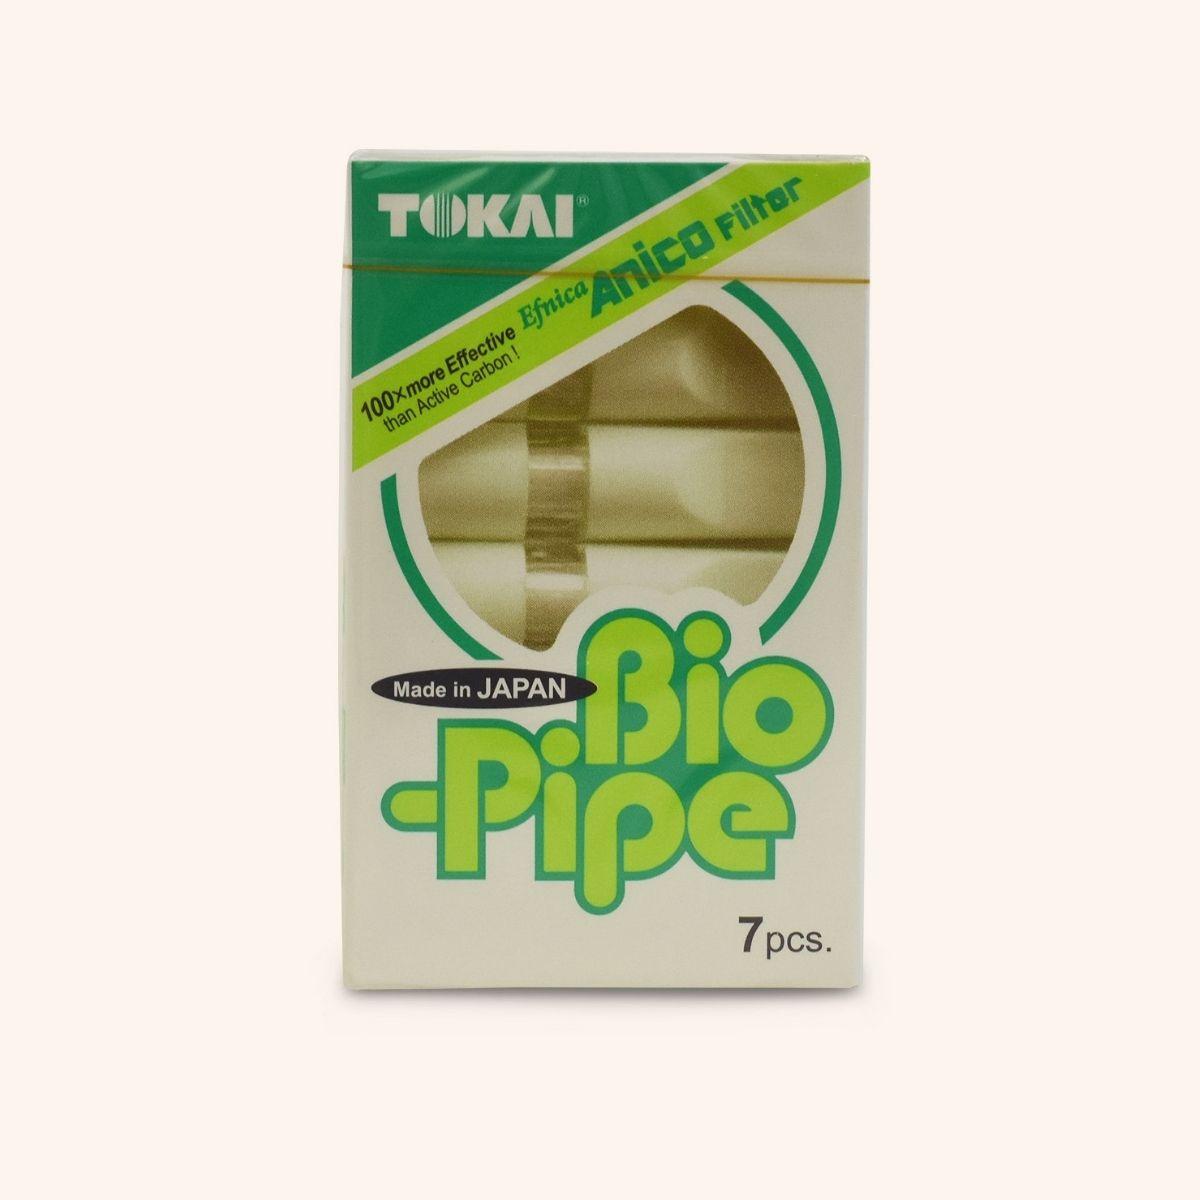 Bio Pipe Filters